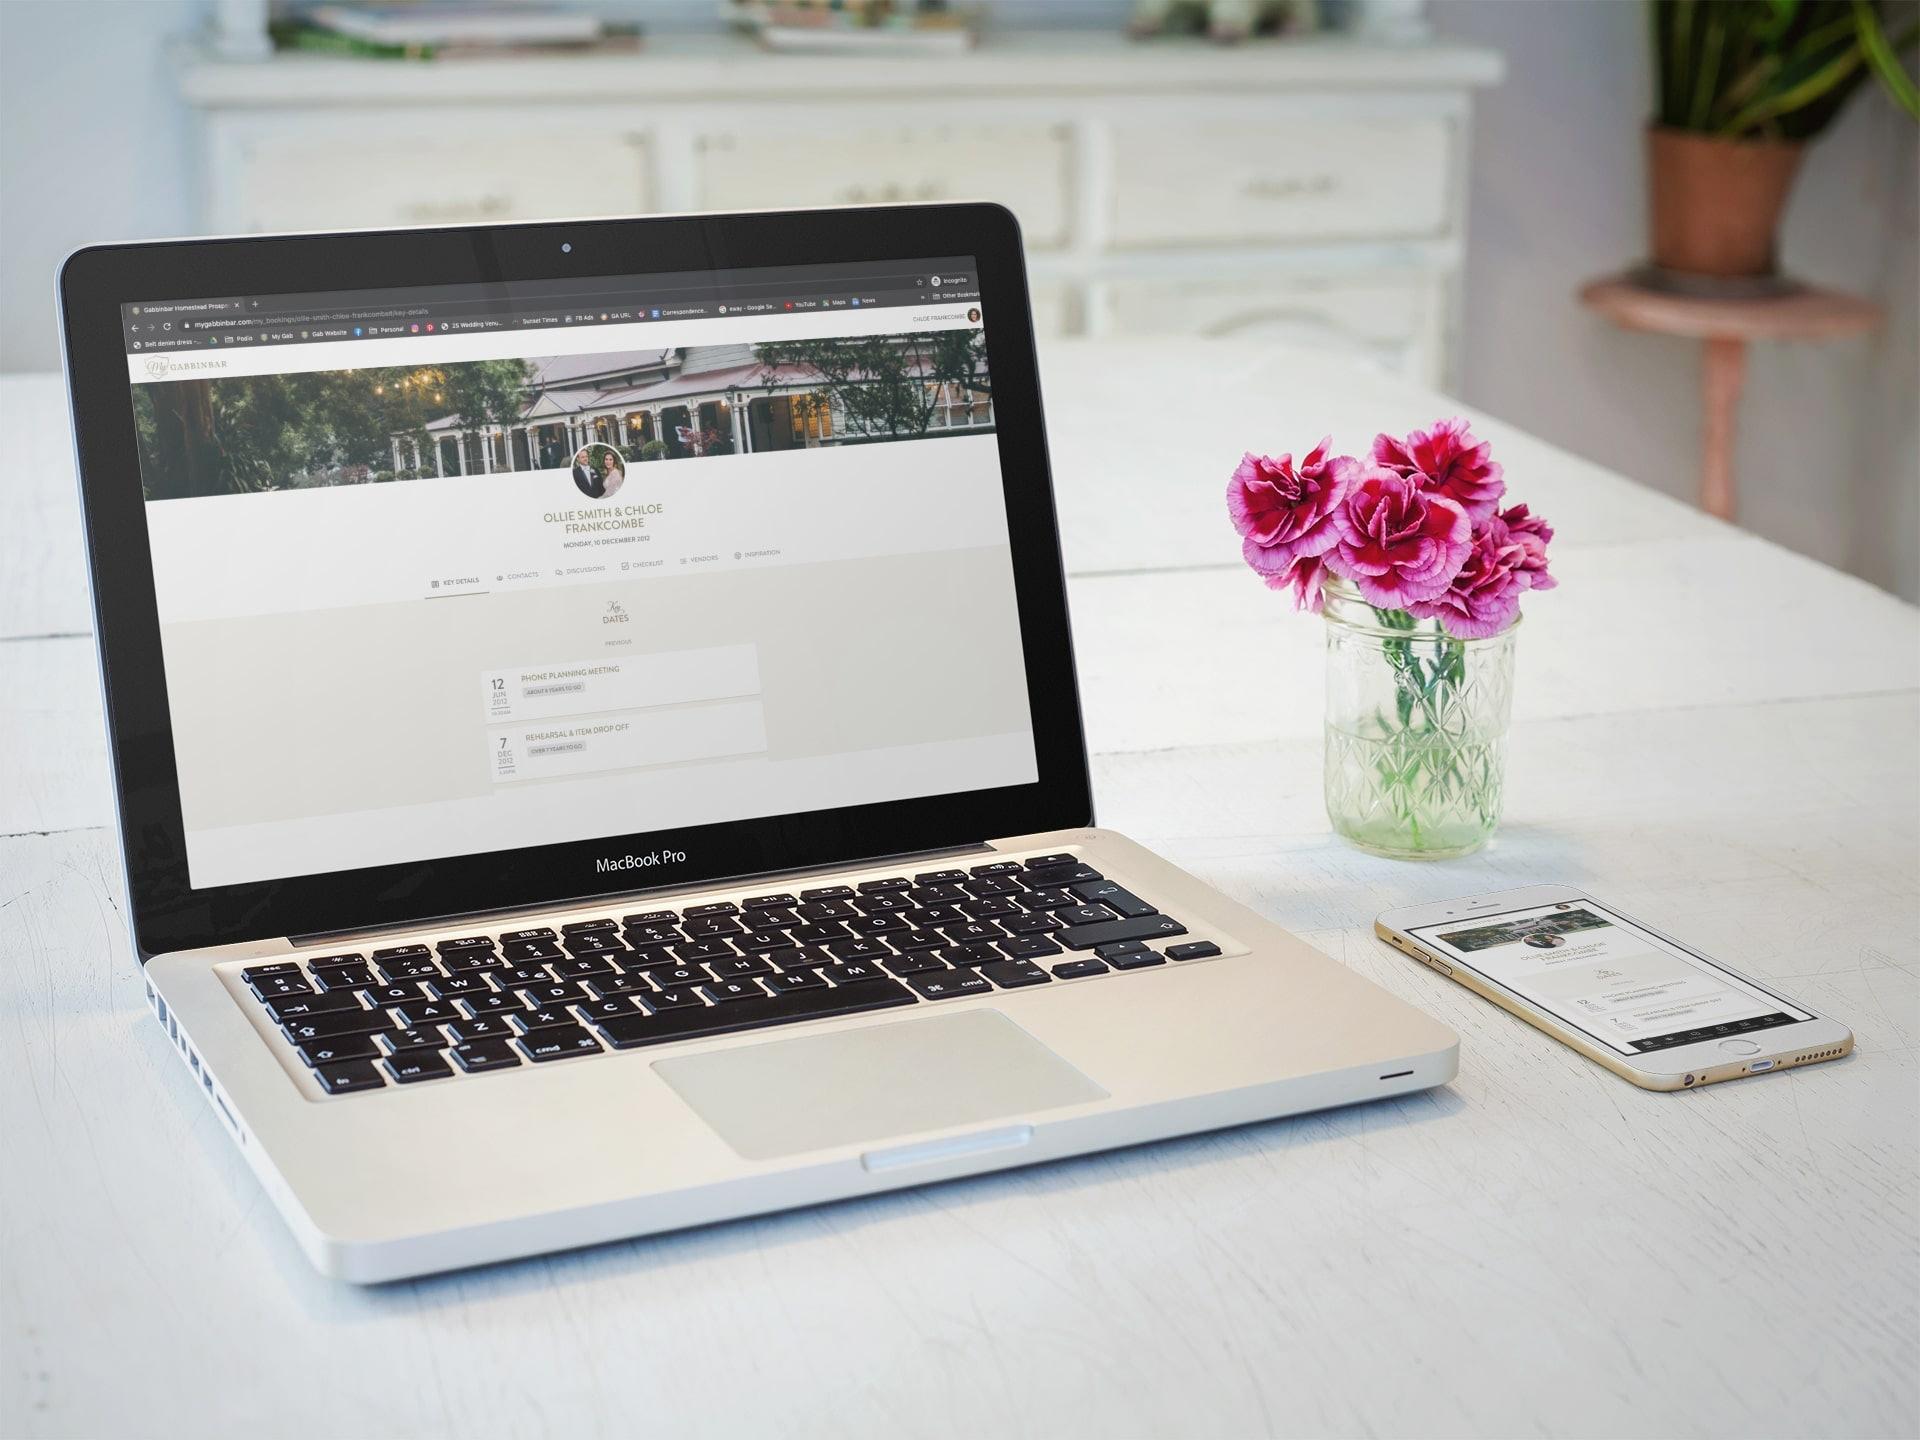 Mygabbinbar portal on computer